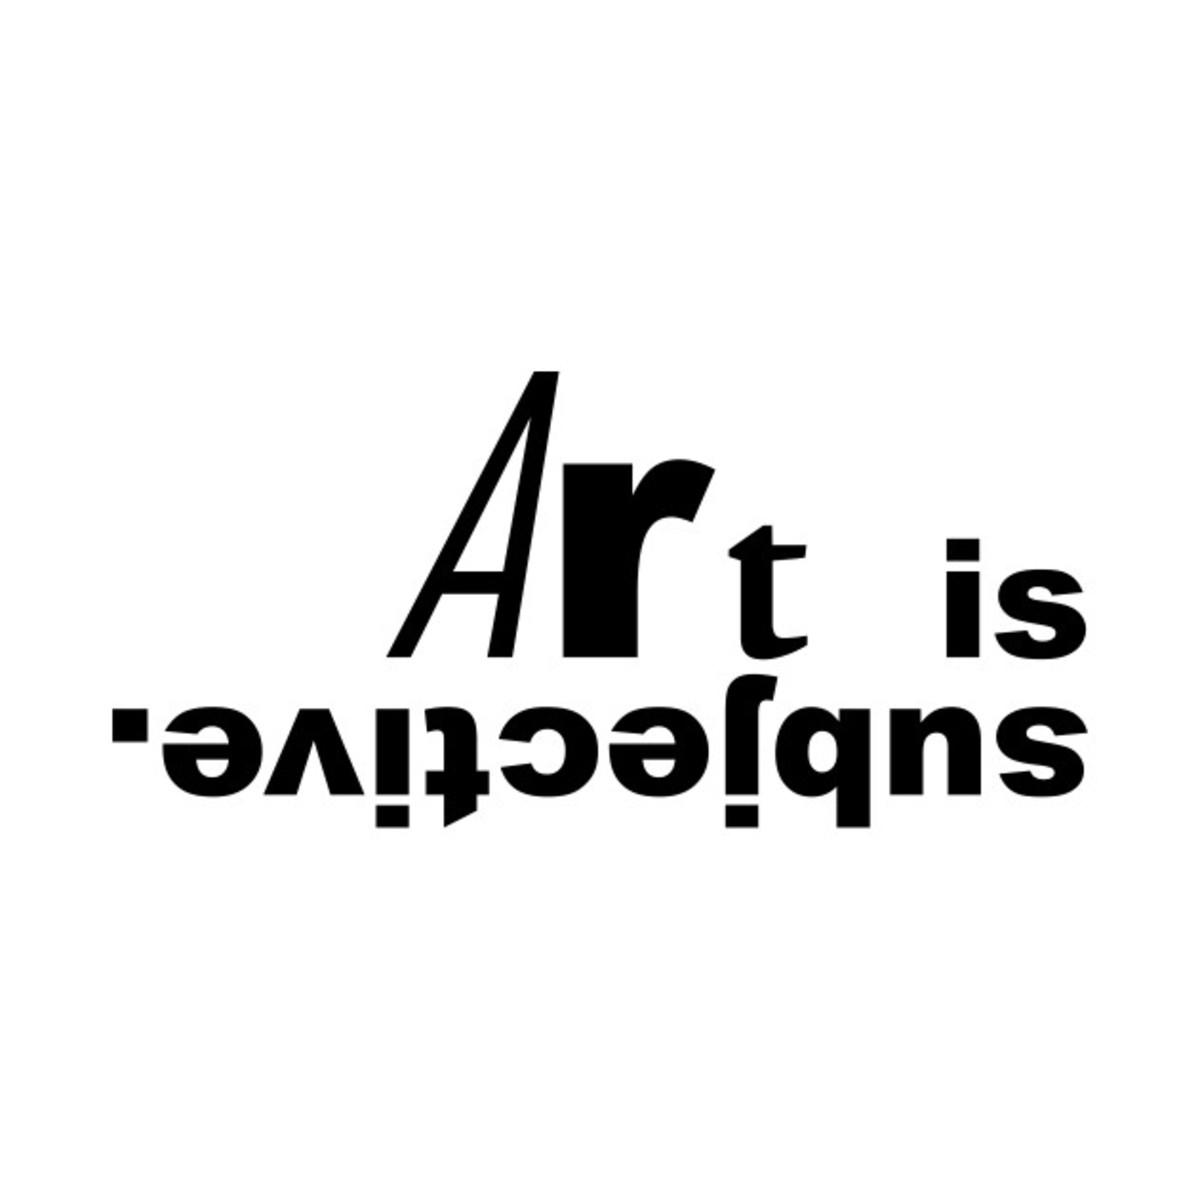 Subjective is art.